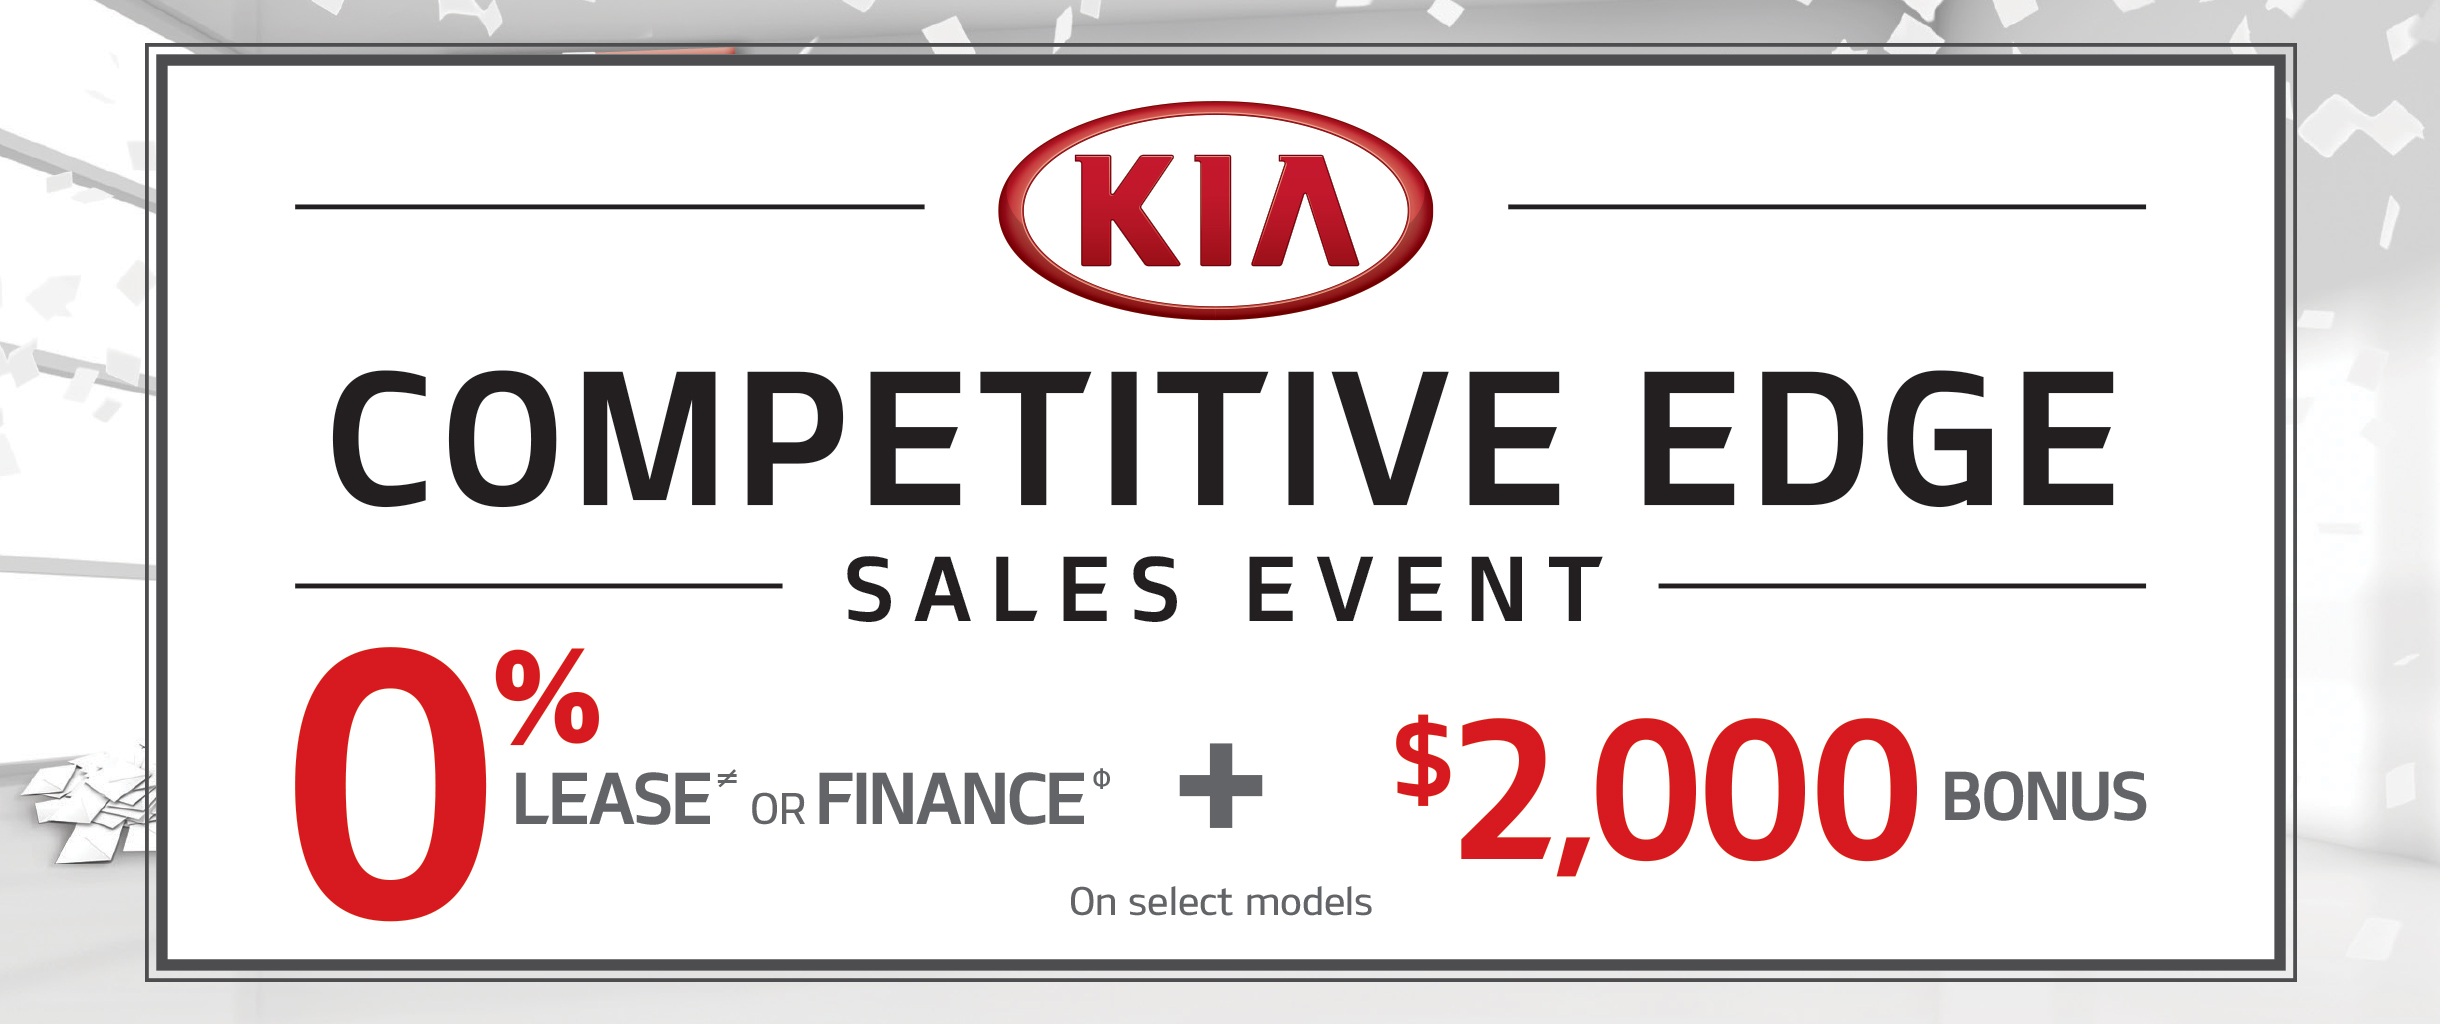 Donnelly Kia - Competitive Edge Sales Event